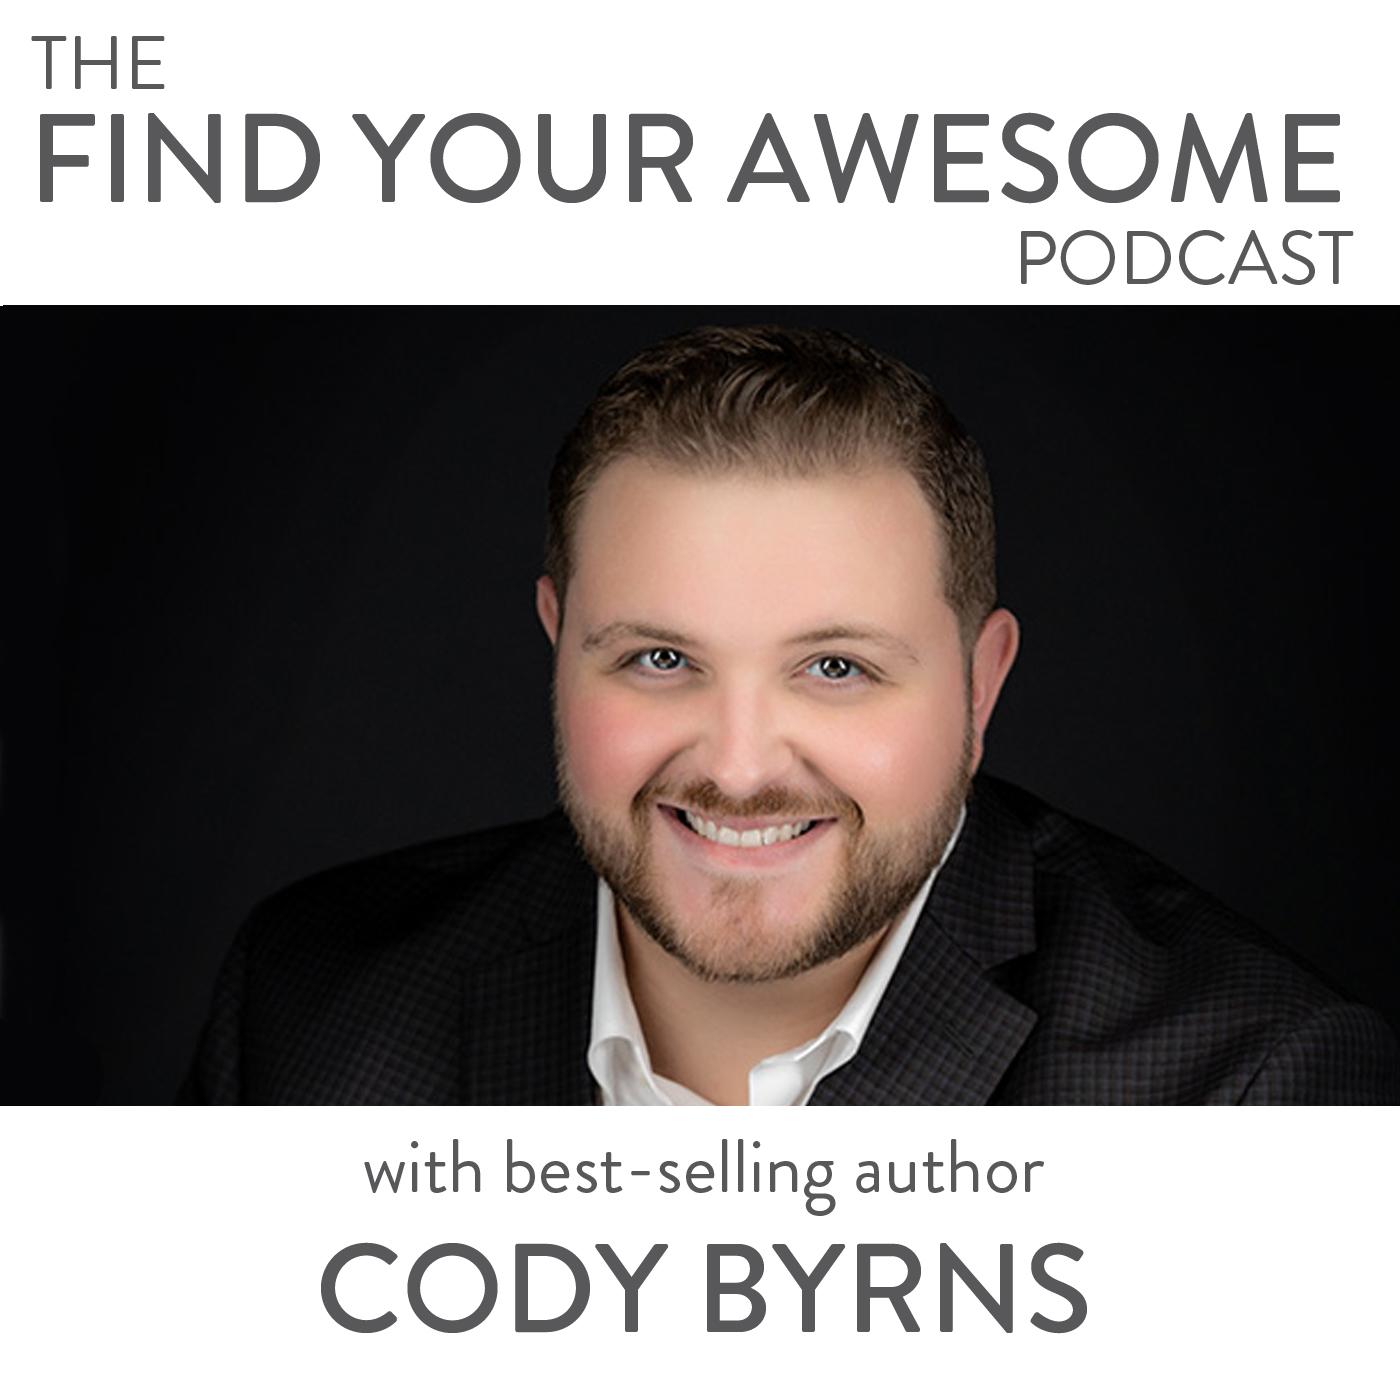 CodyByrns_podcast_coverart.jpg